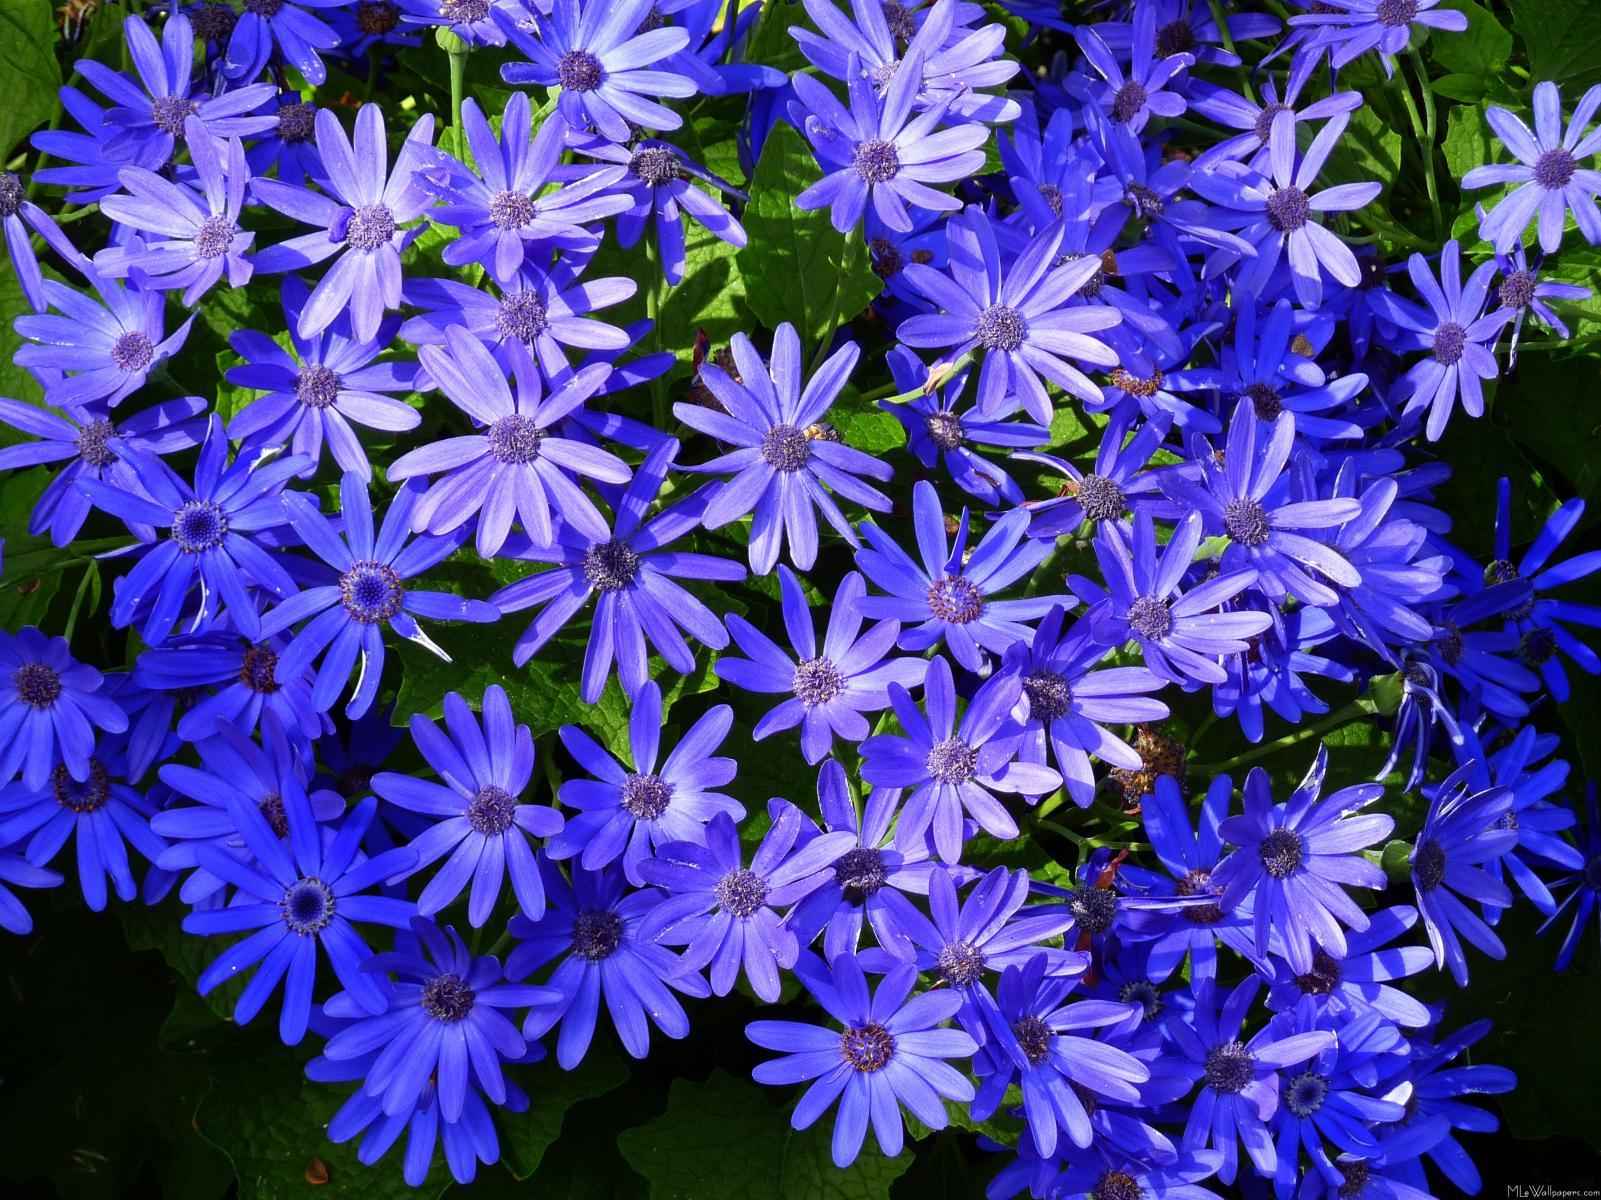 MLeWallpapers.com - Blue Daisy-like Flowers